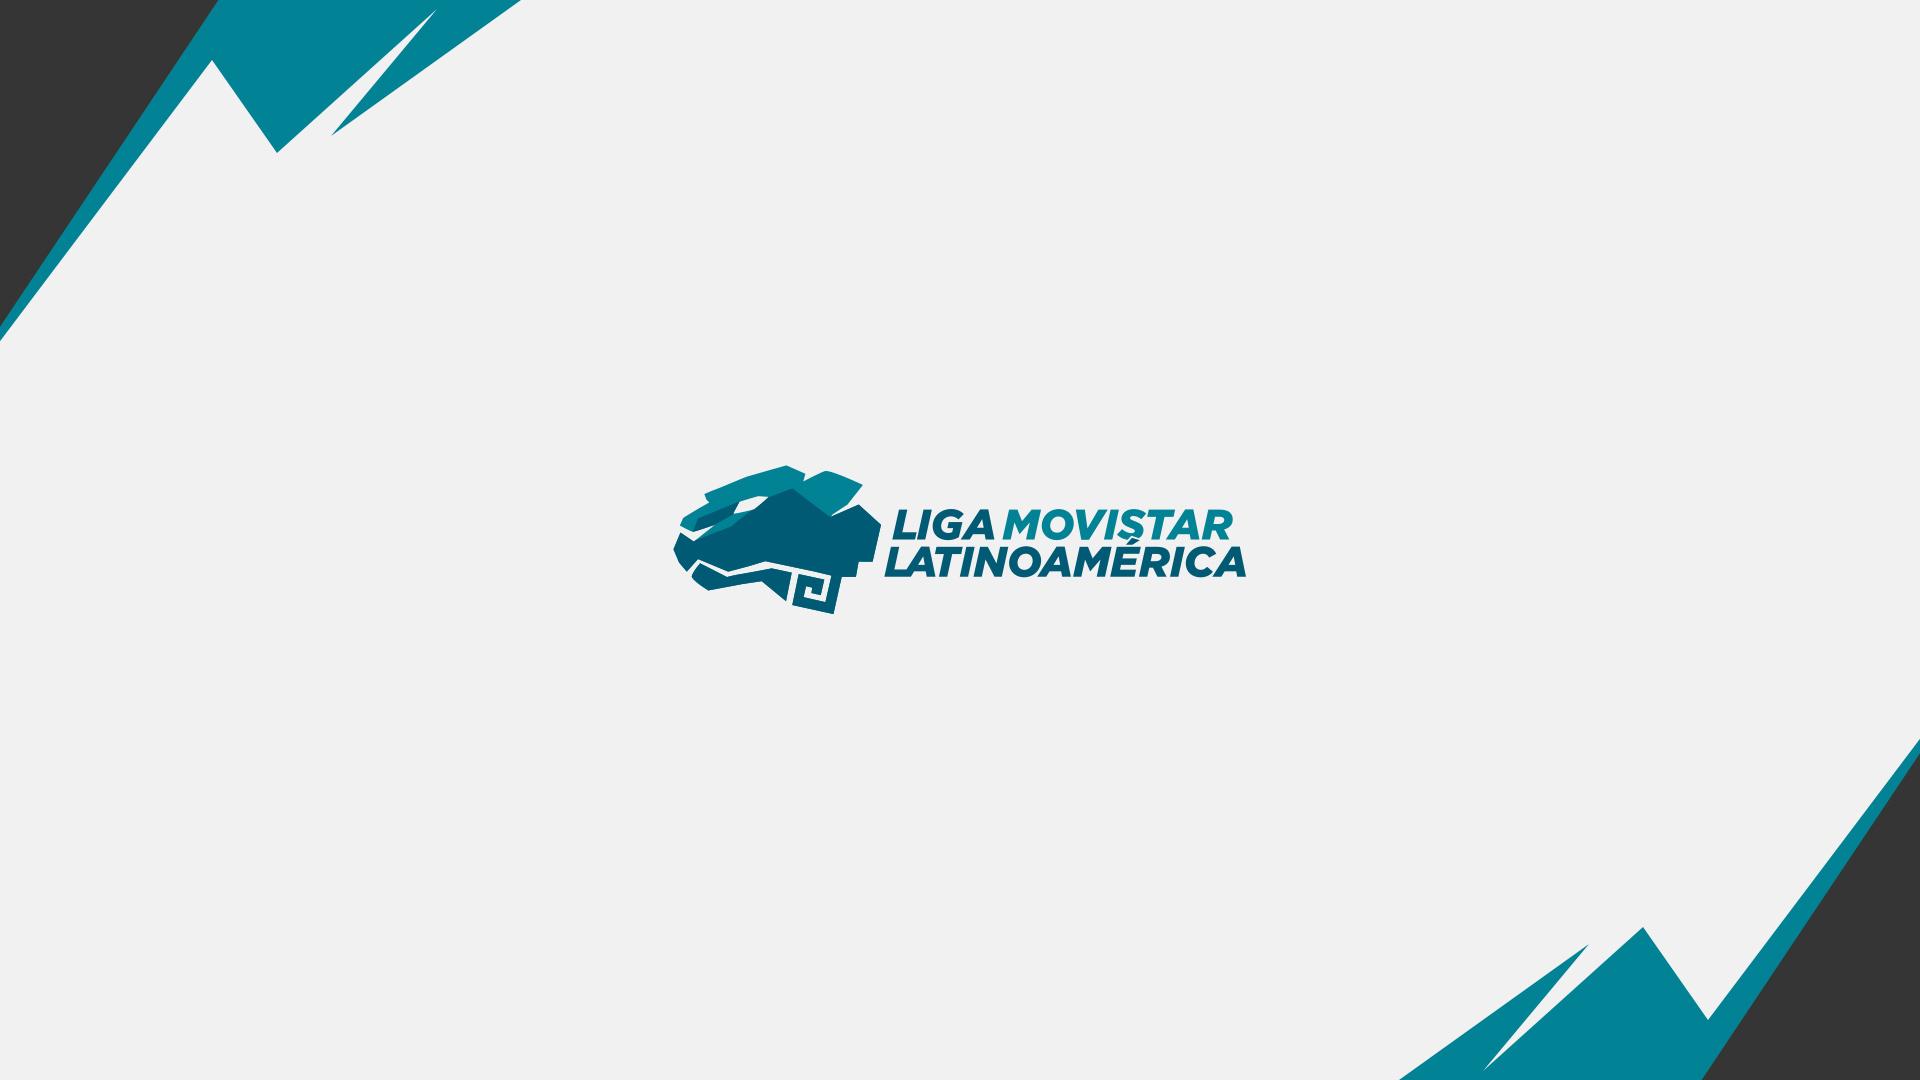 c912711004 No te pierdas la Liga Movistar Latinoamérica 2019!